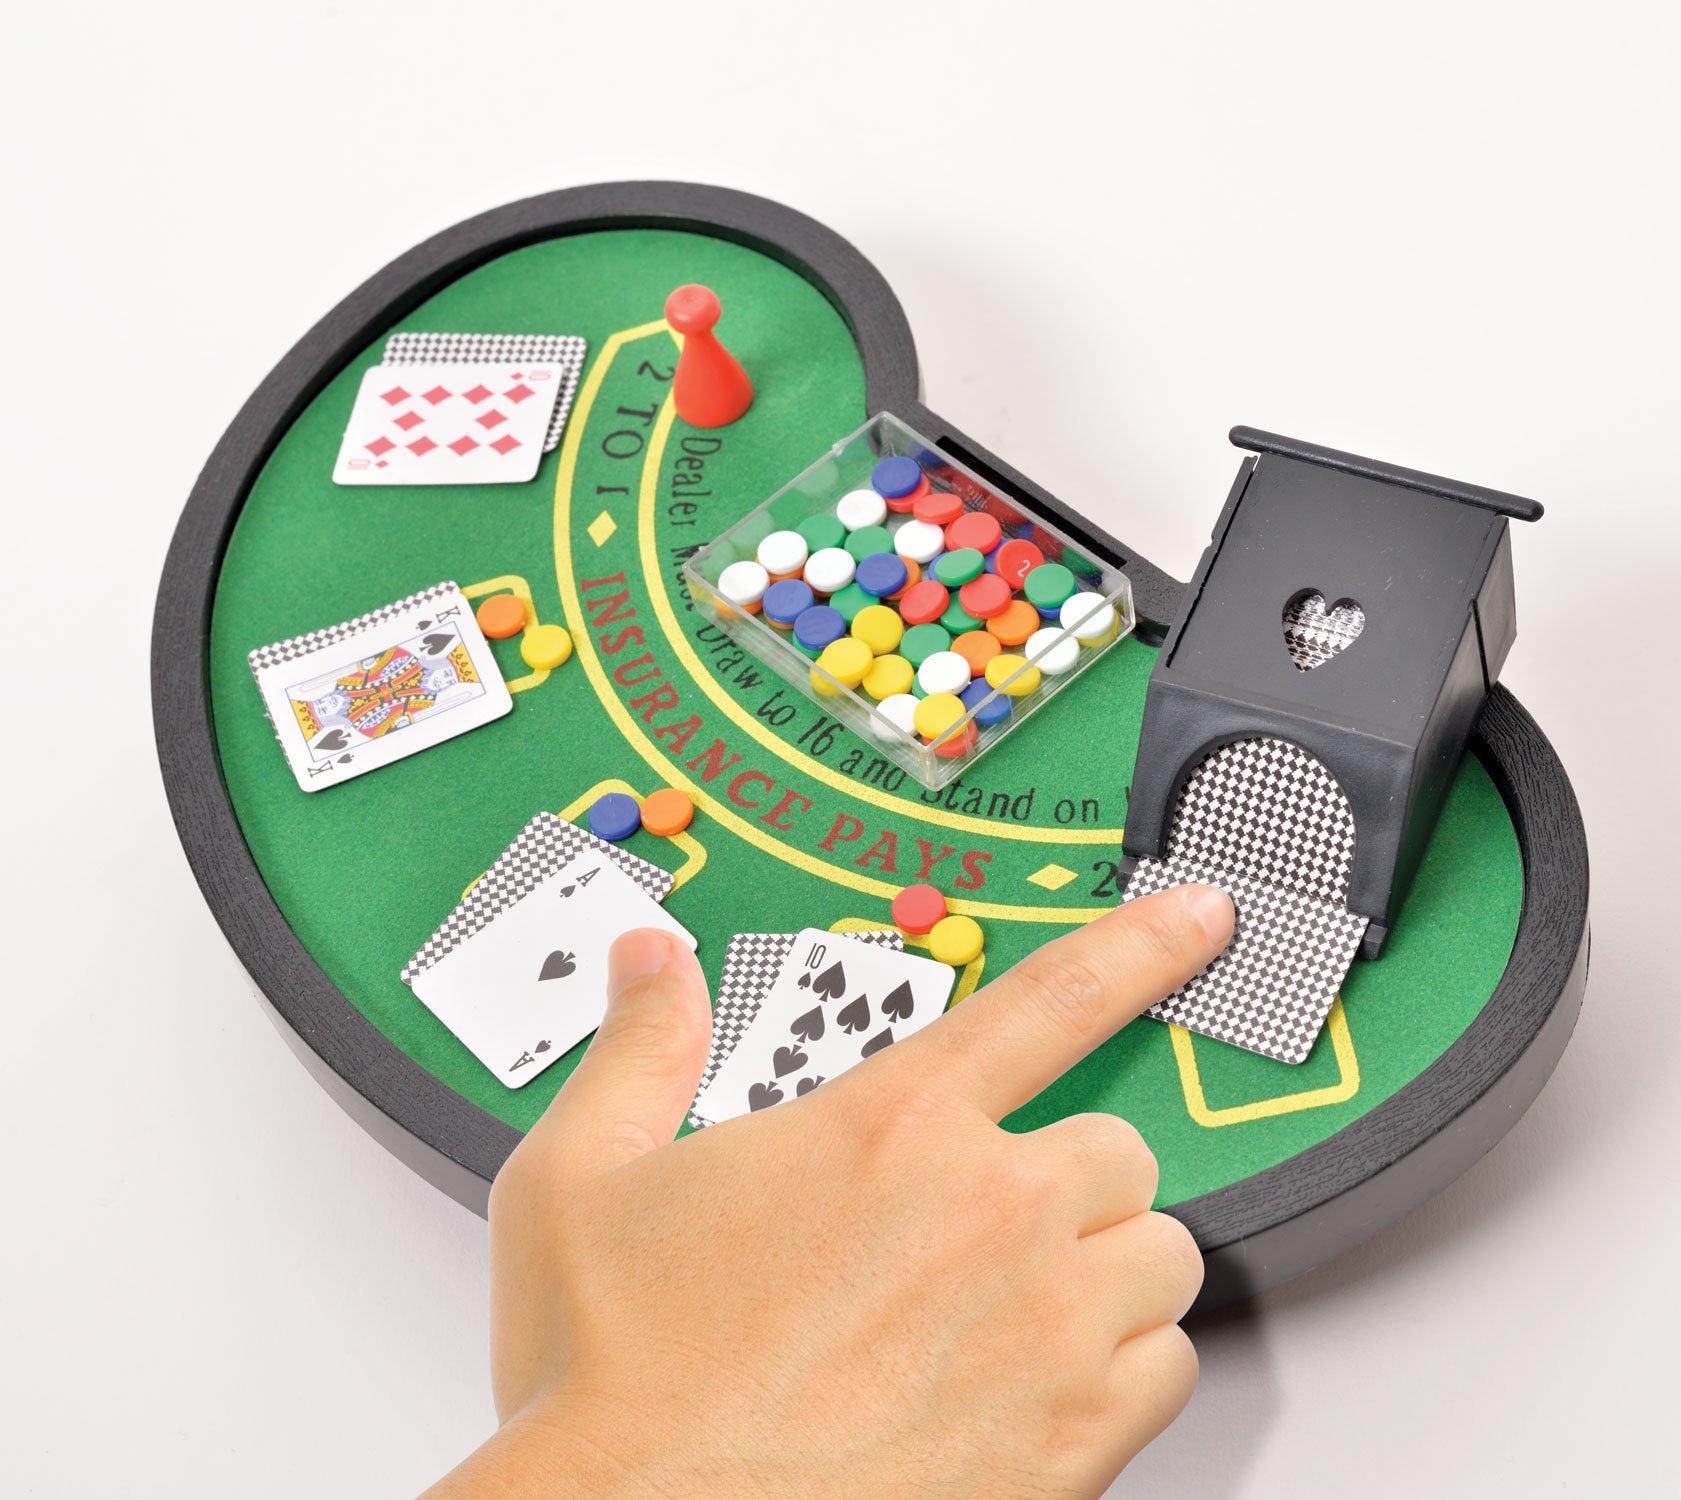 Desktop Miniature Blackjack Table Set With Mini Card Deck